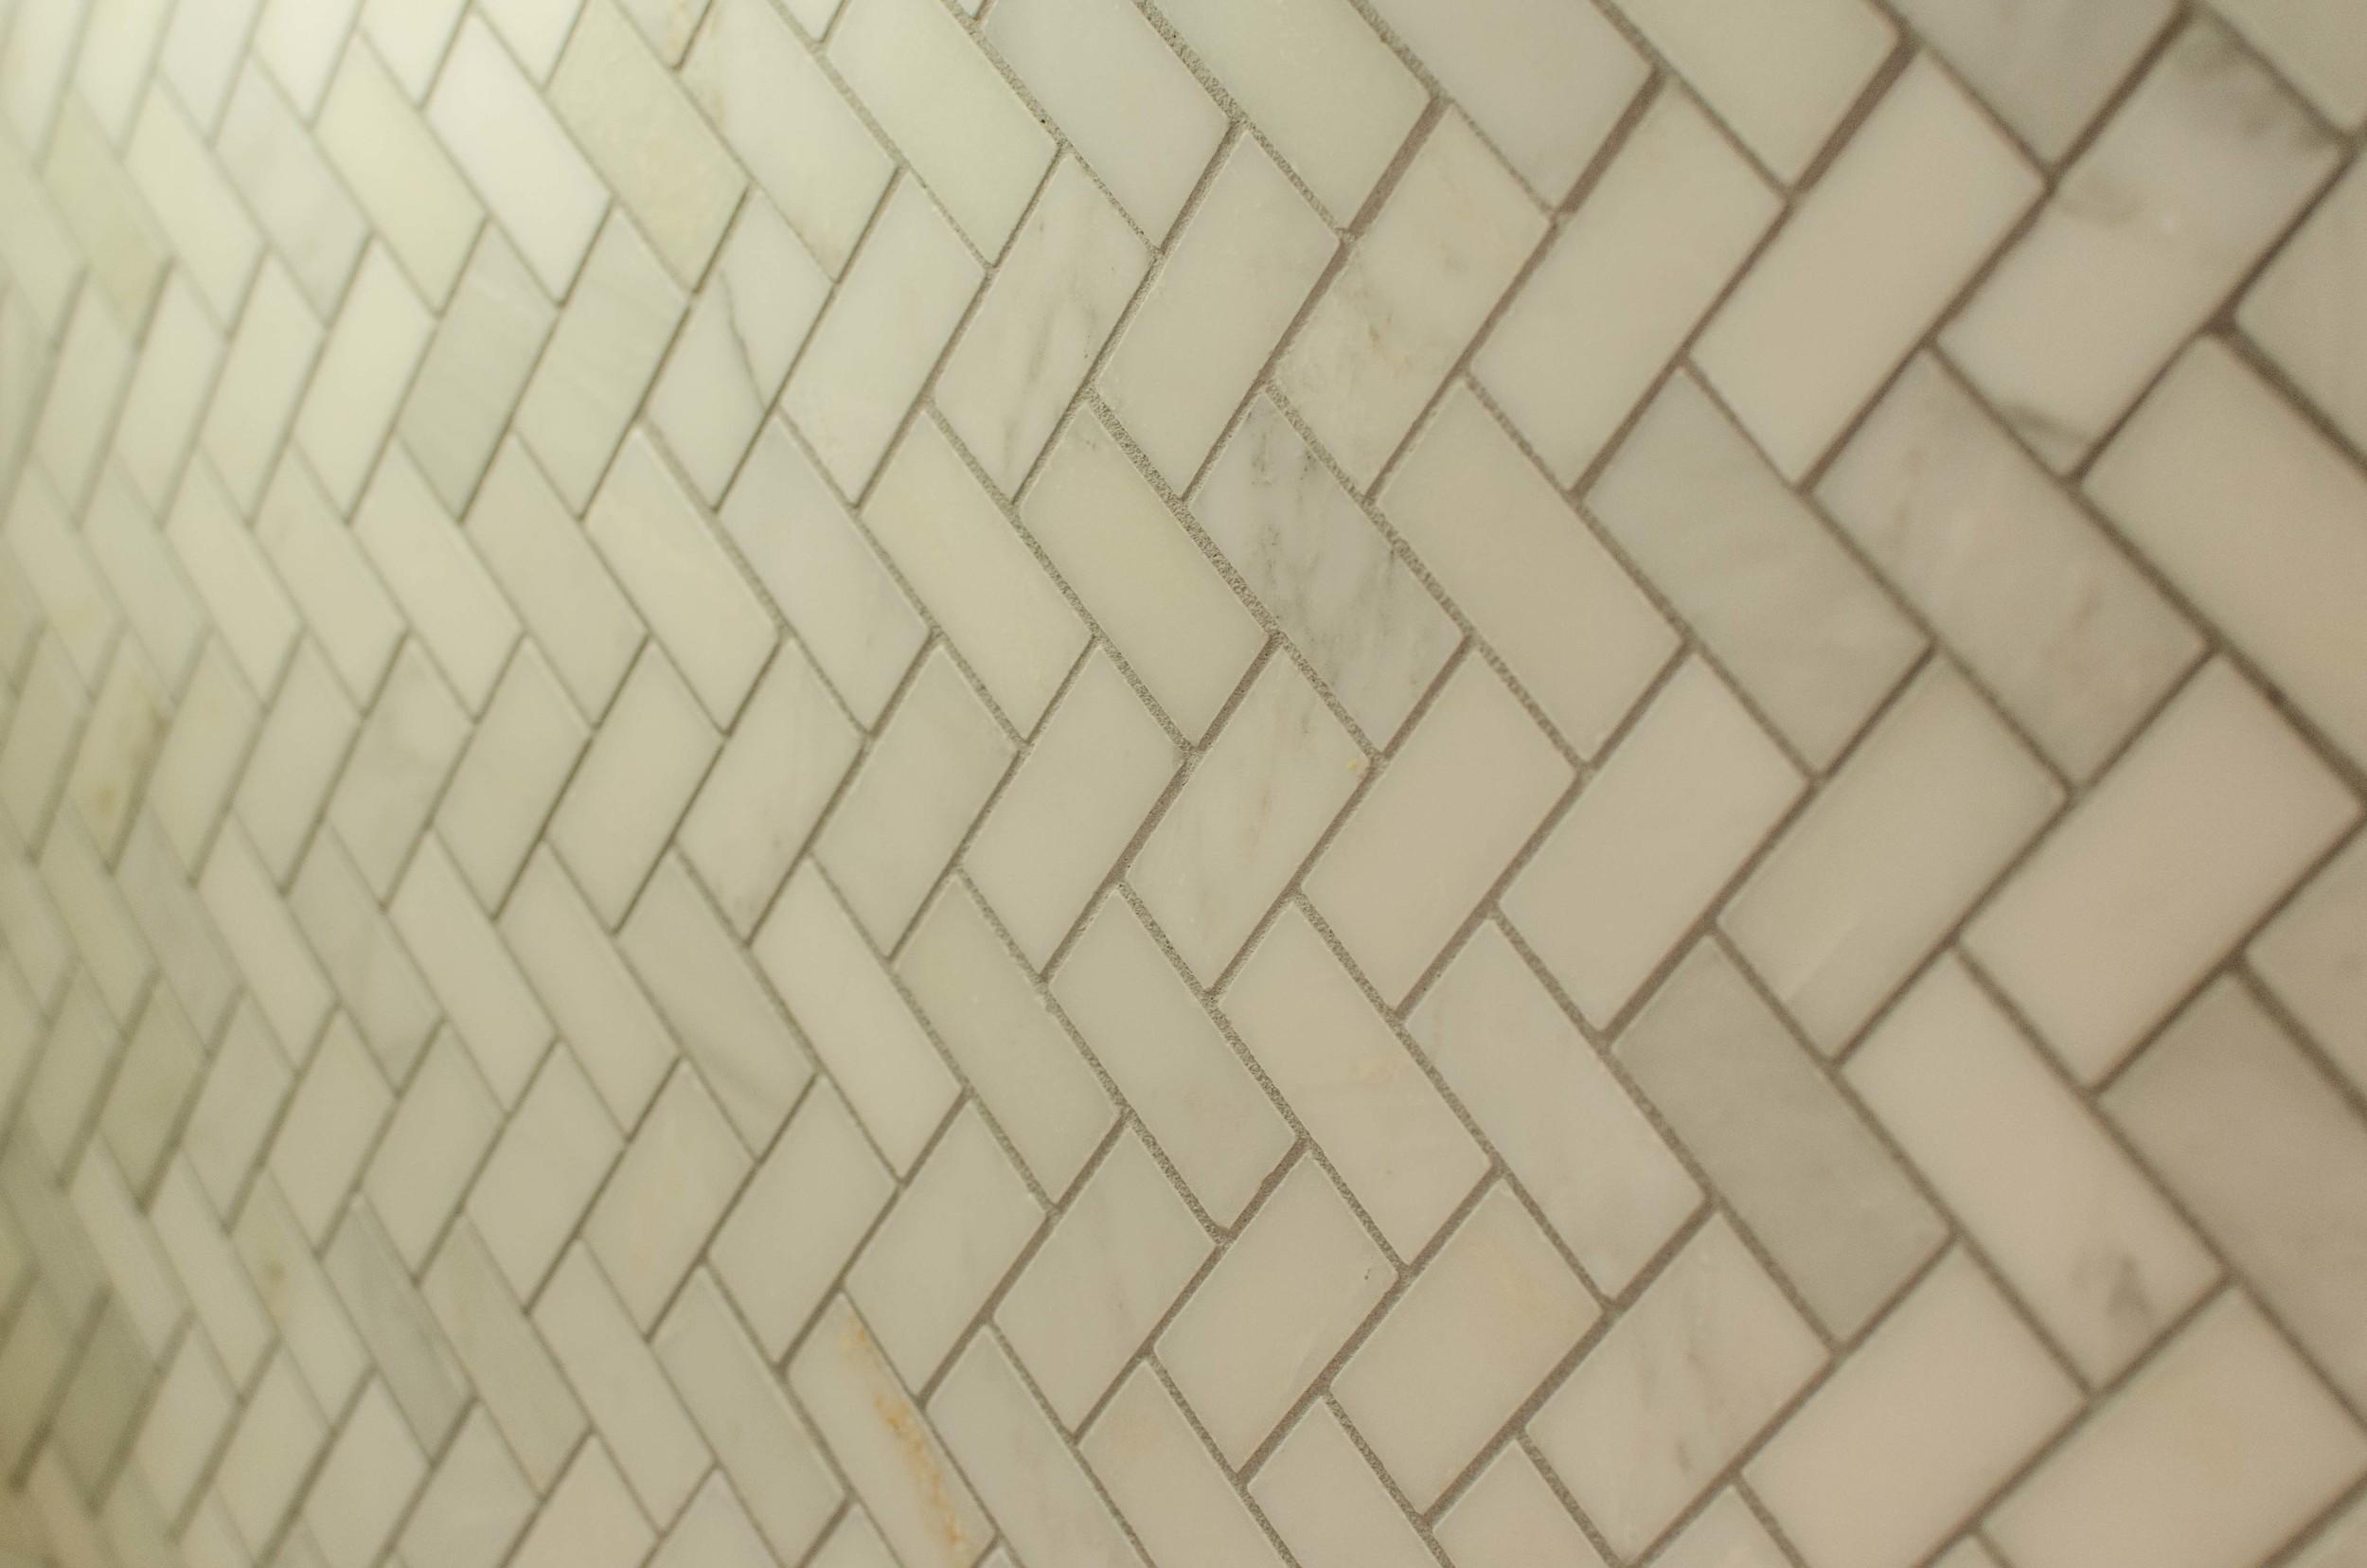 Chevron marble tile on it's side